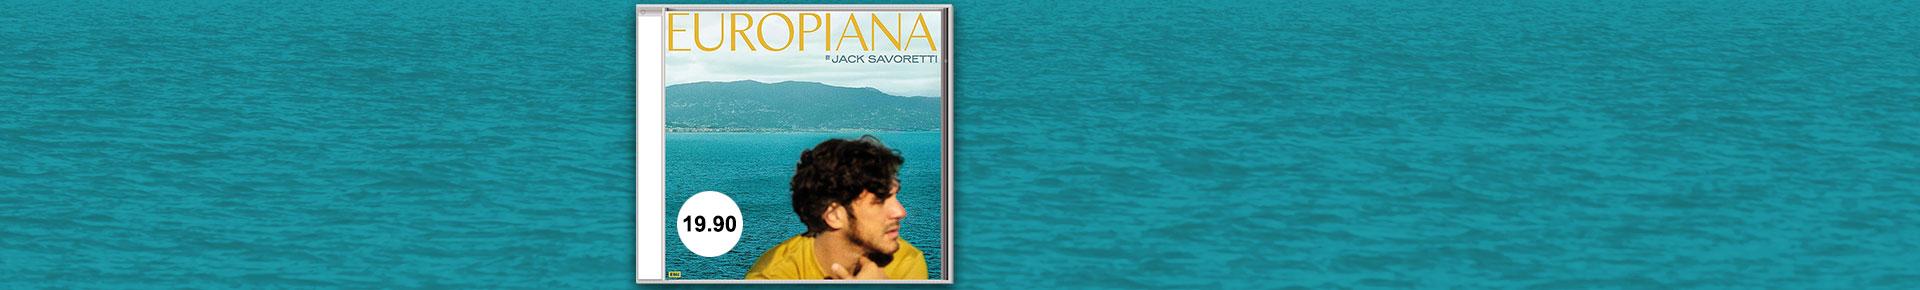 «Europiana» von Jack Savoretti jetzt portofrei bestellen.